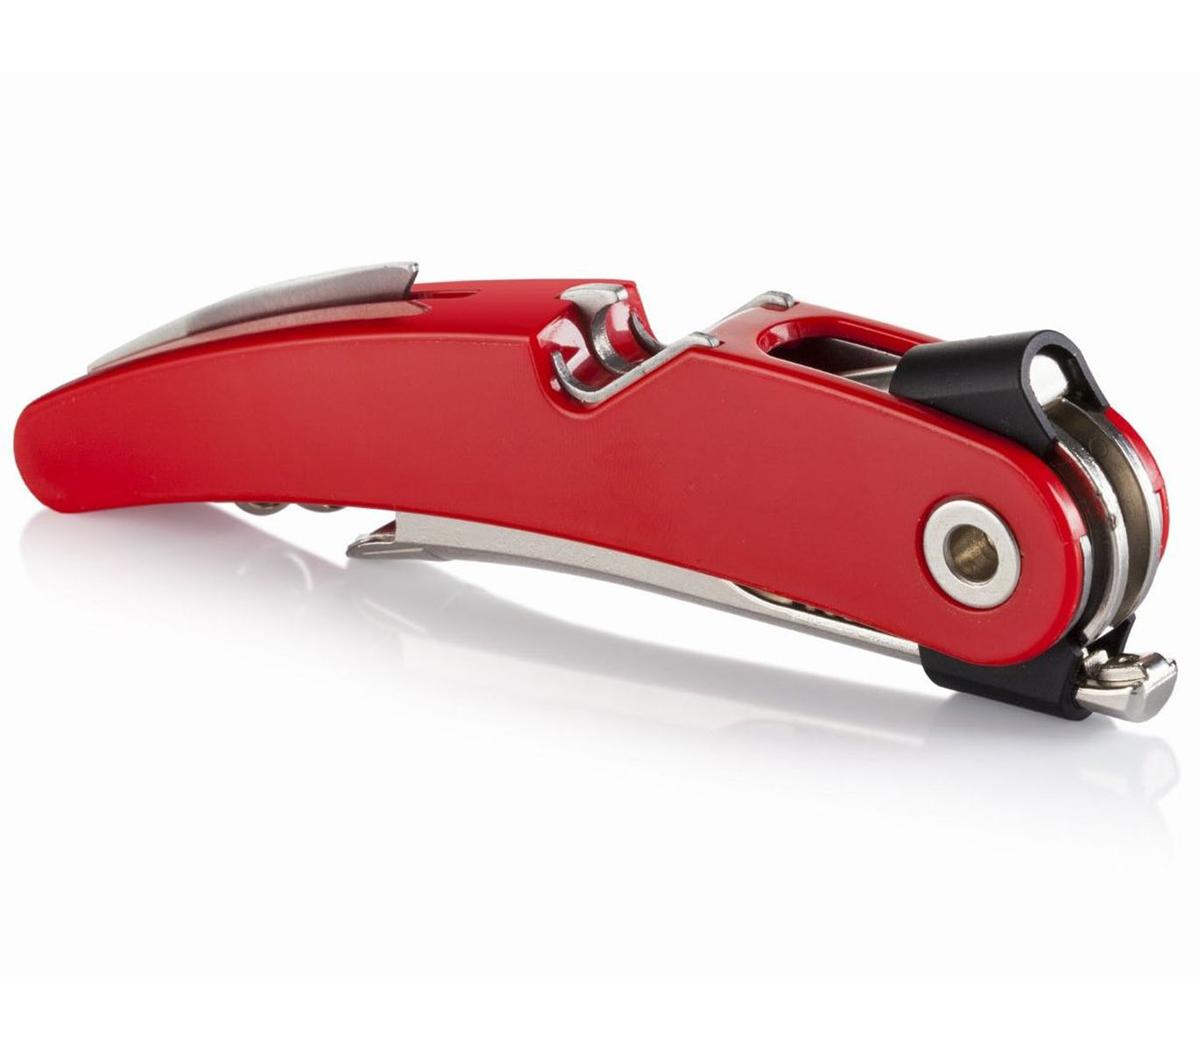 Штопор VacuVin Single Pull, цвет: красный, серебристый vacuvin штопор официанта waiters corkscrew черный